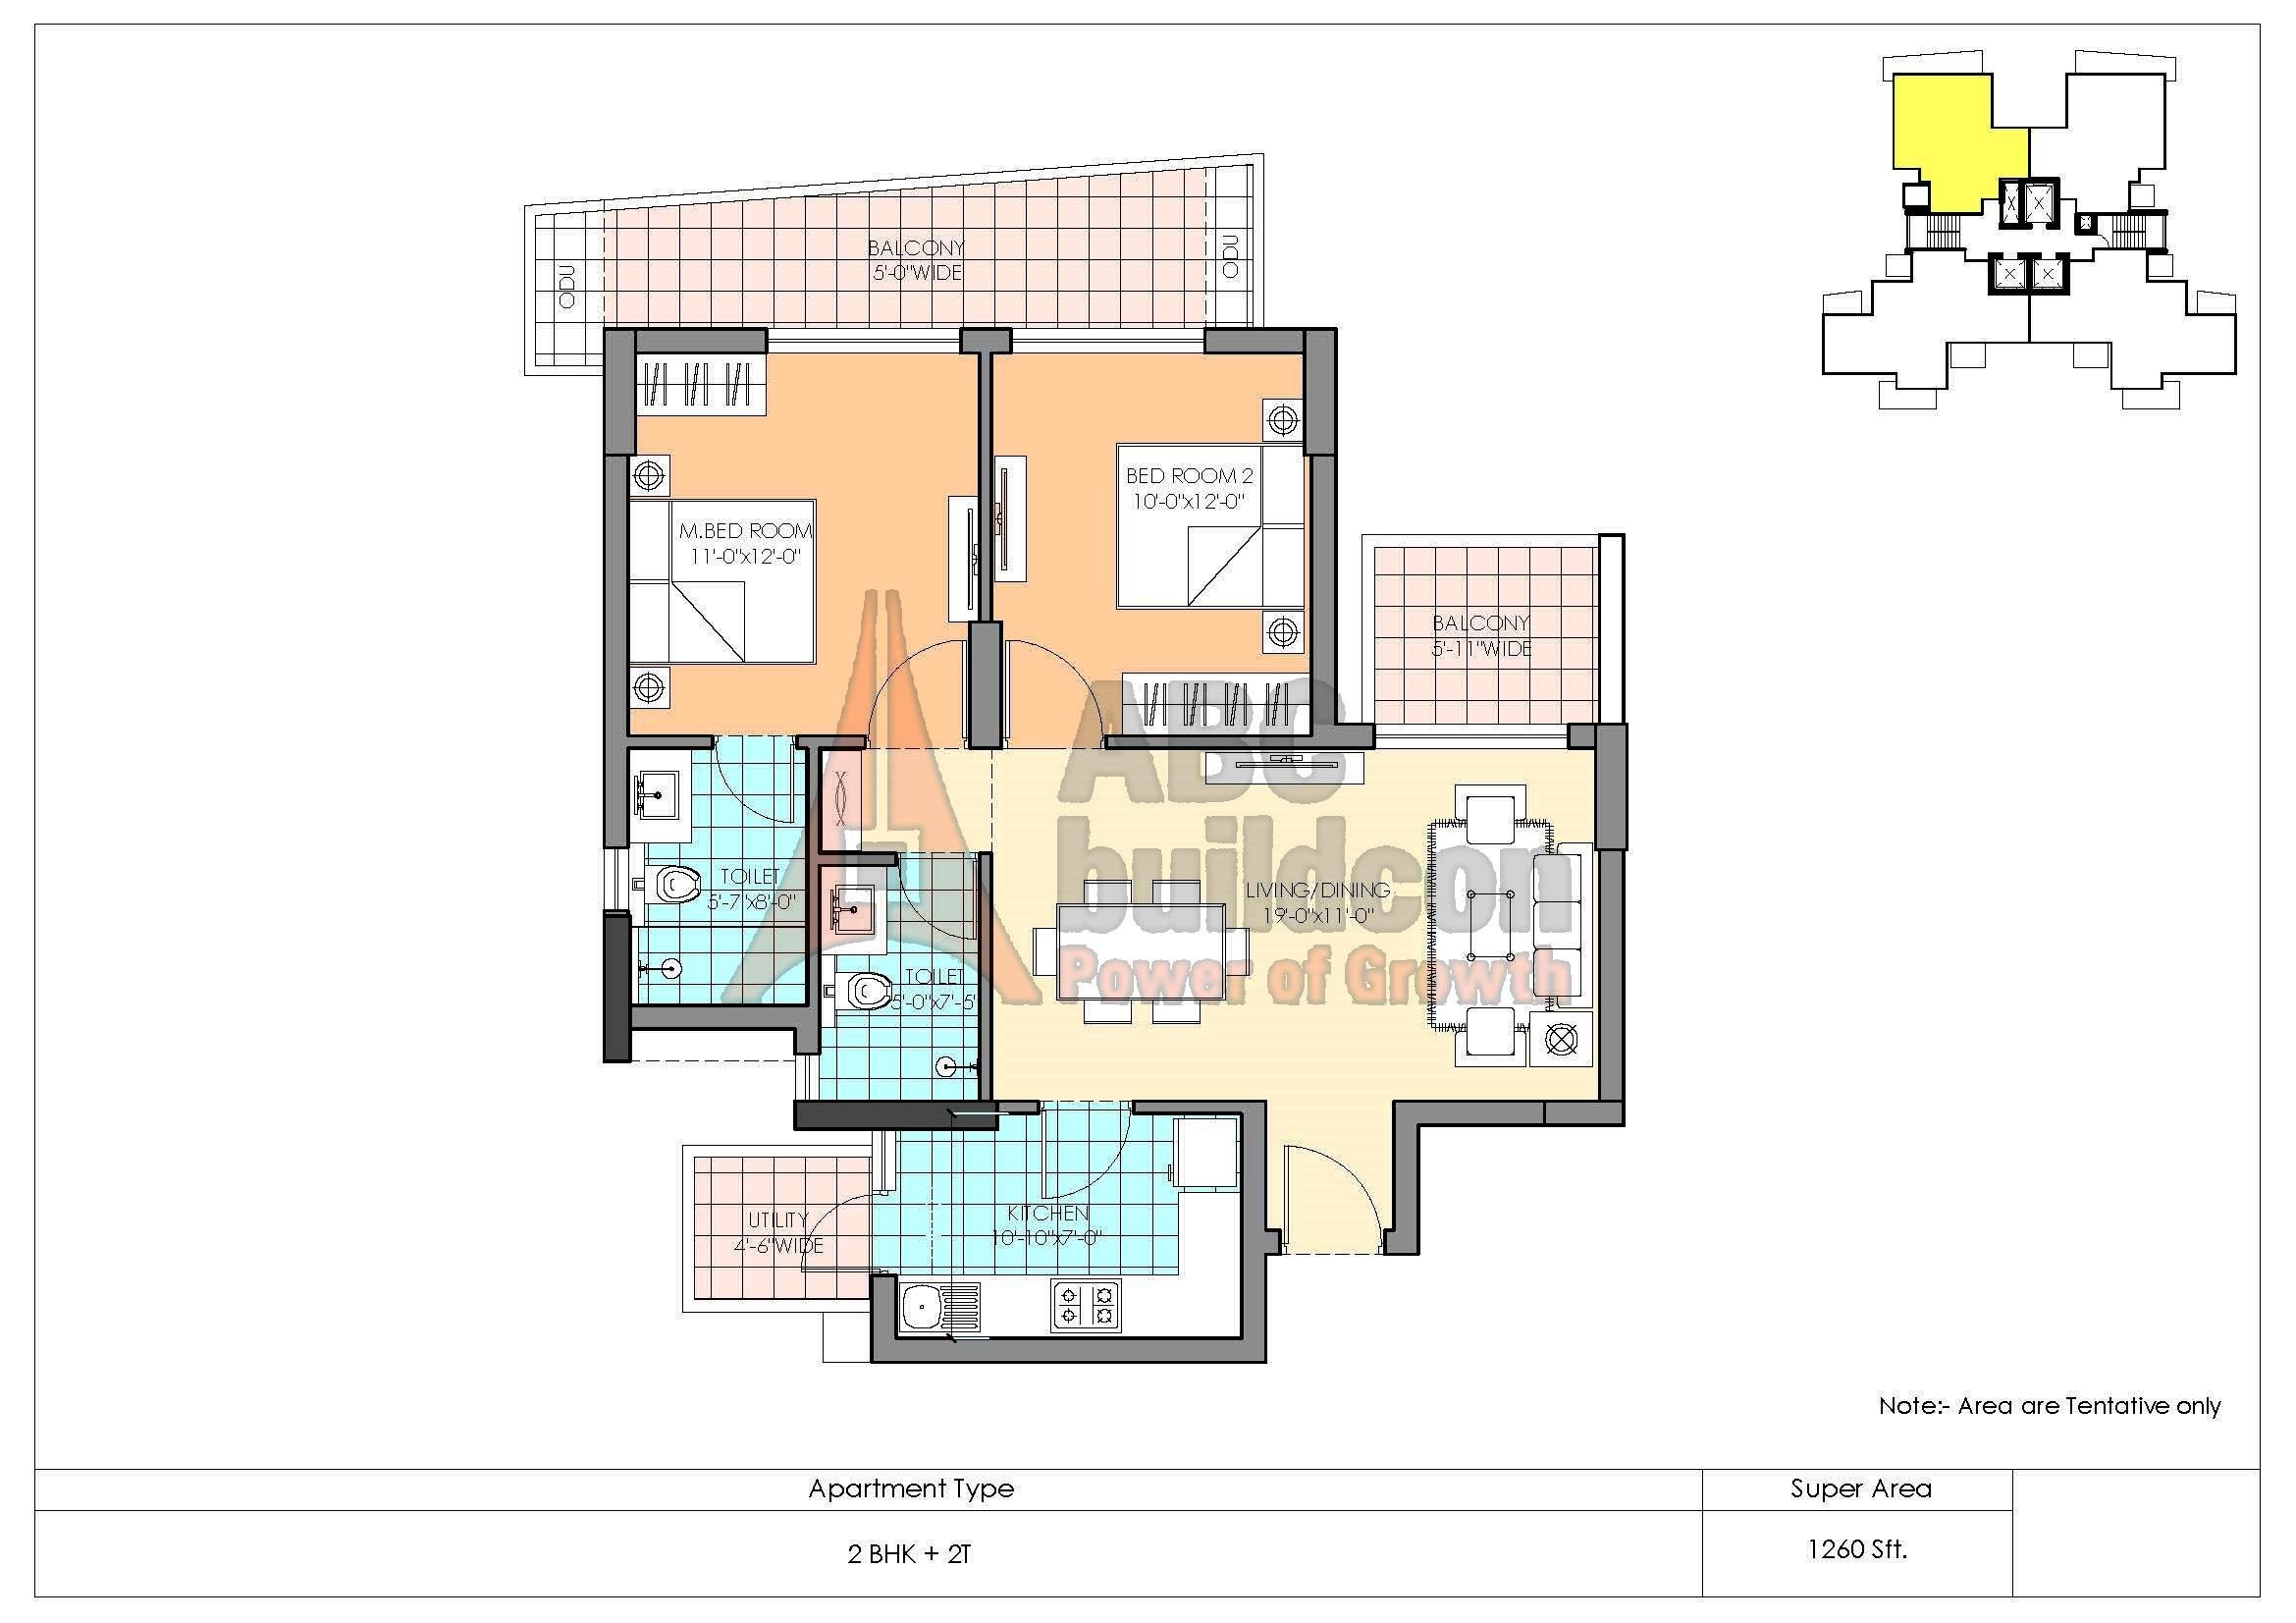 M3m Marina Floor Plan Floorplan In